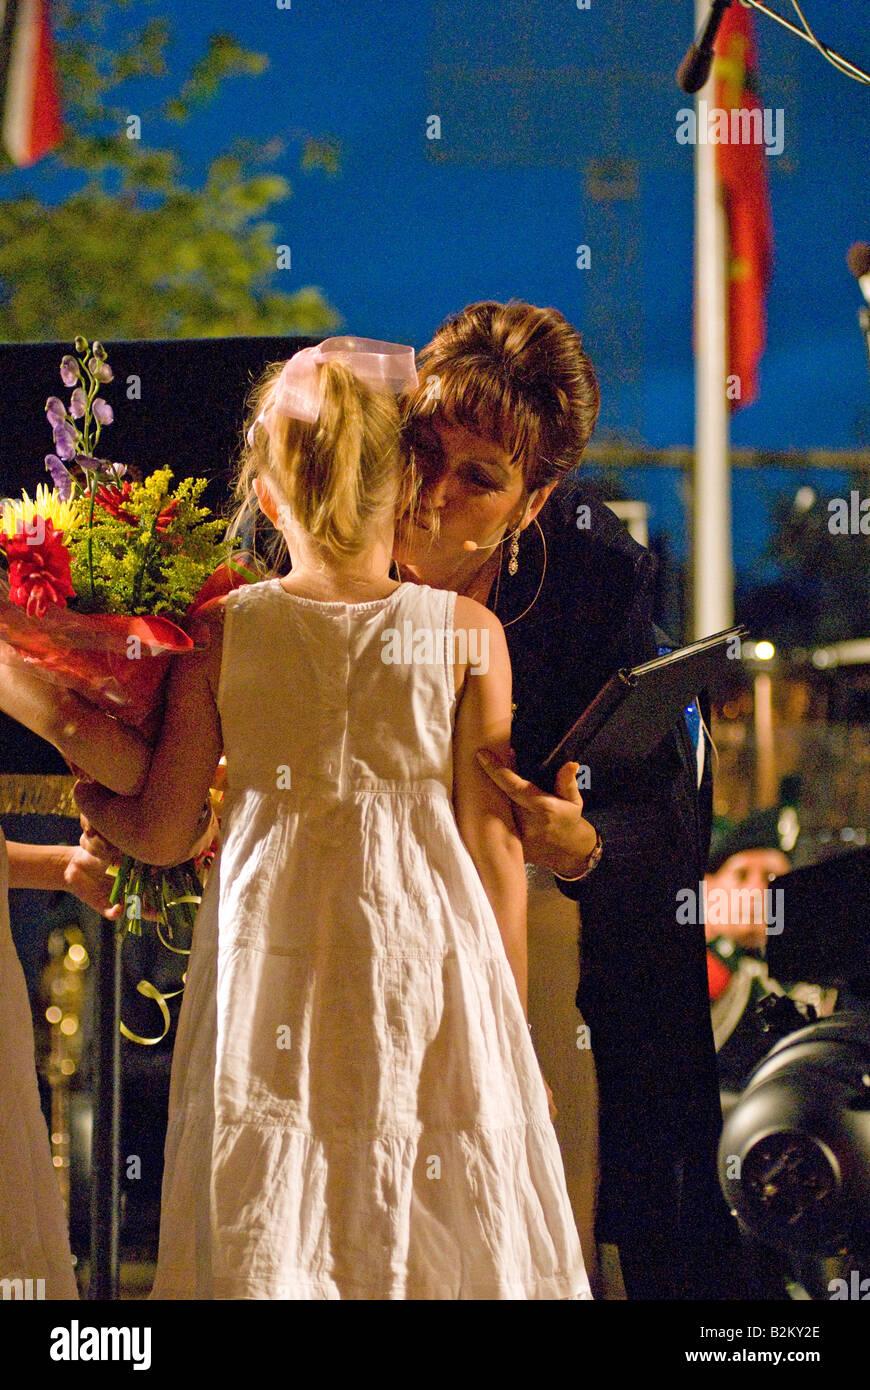 Nine-year-old Taisiya Maslyakova performed at the leading large concert 05.27.2015 21